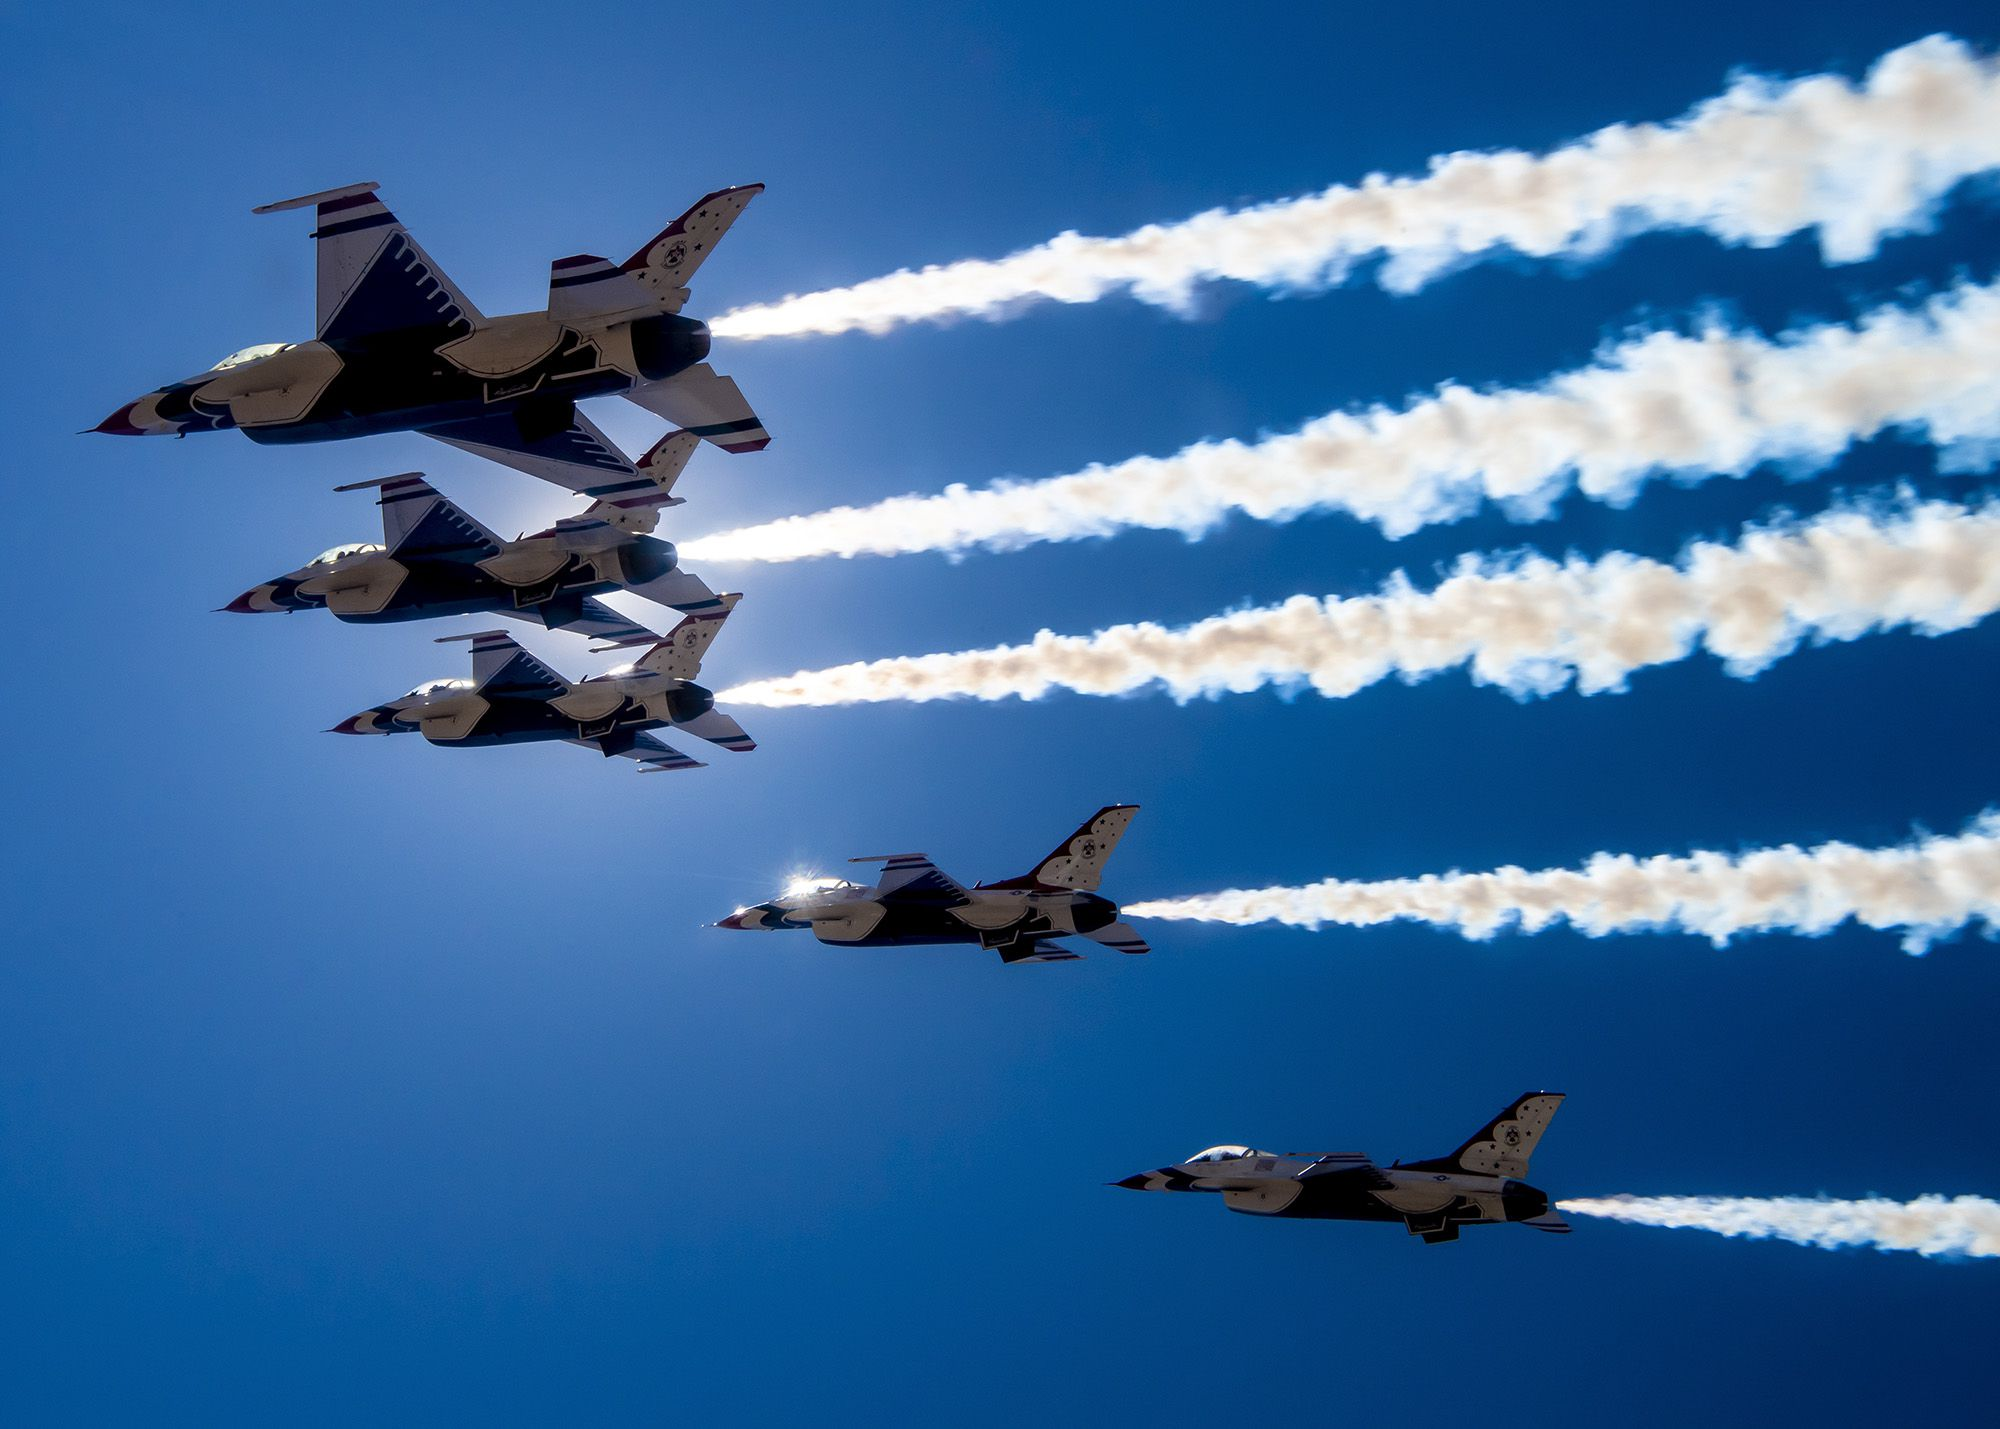 Thunderbirds shake up aerial show for 2021 return